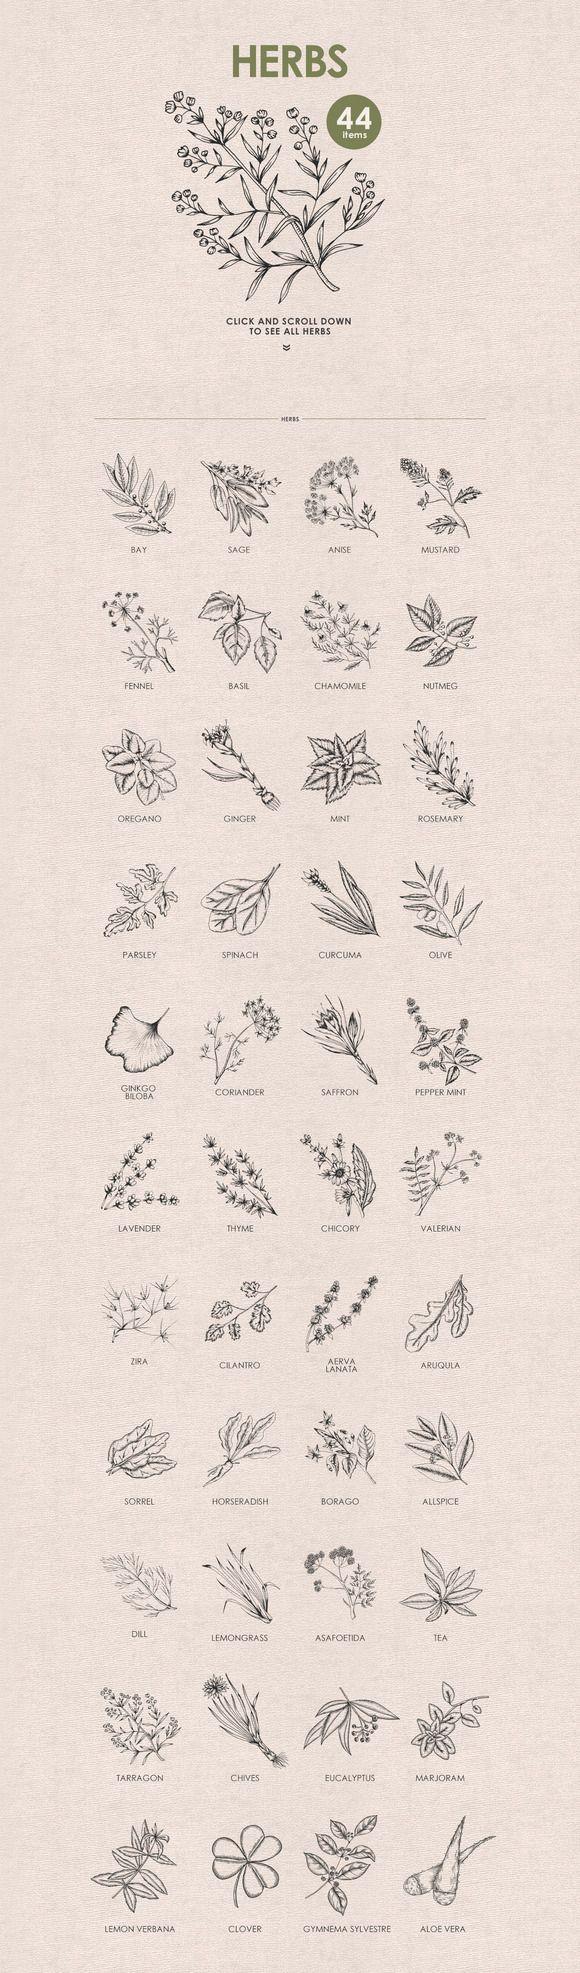 best tattoo ideas images on pinterest tattoo ideas butterfly